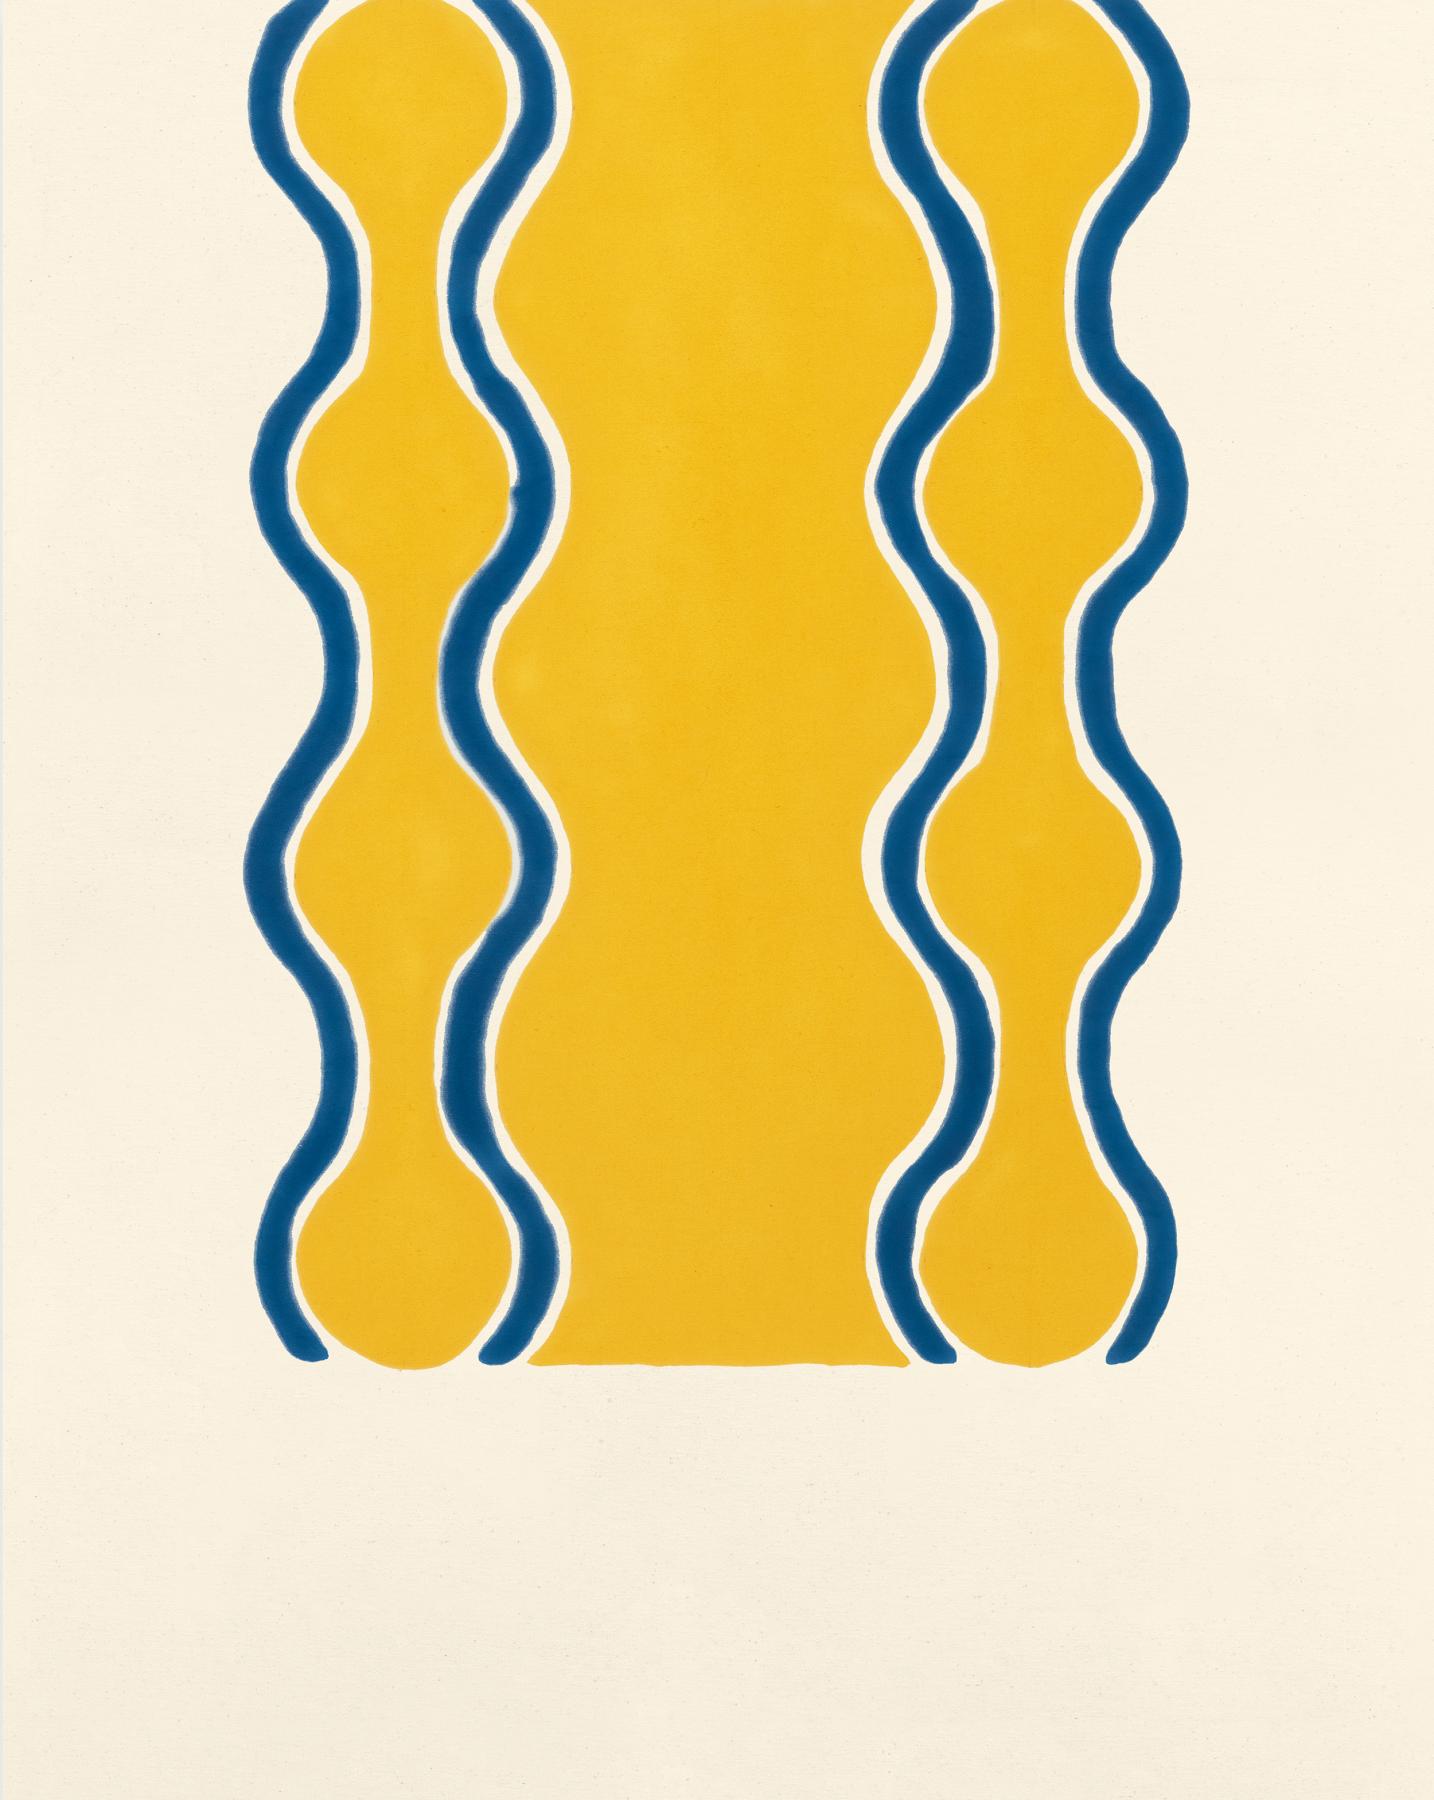 Untitled, 1963, Oil-based enamel on canvas